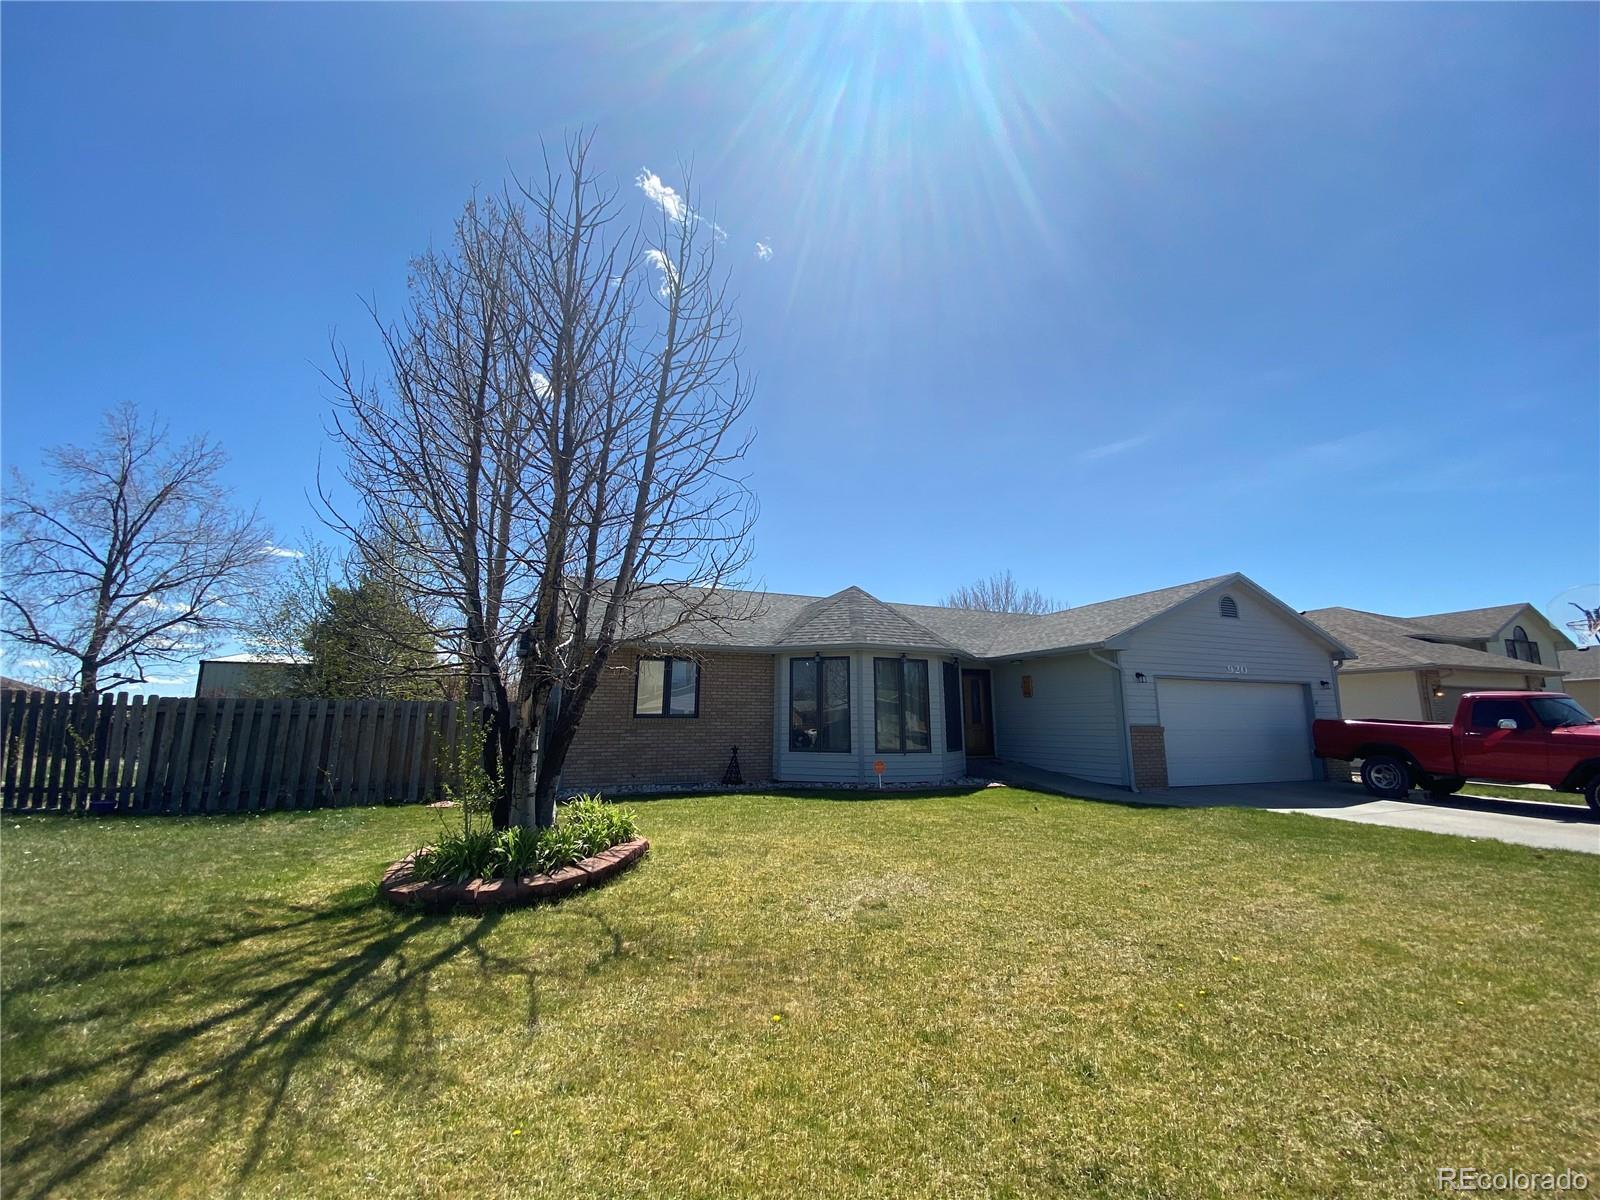 920 Meng Drive, Fort Morgan, CO 80701 - Fort Morgan, CO real estate listing